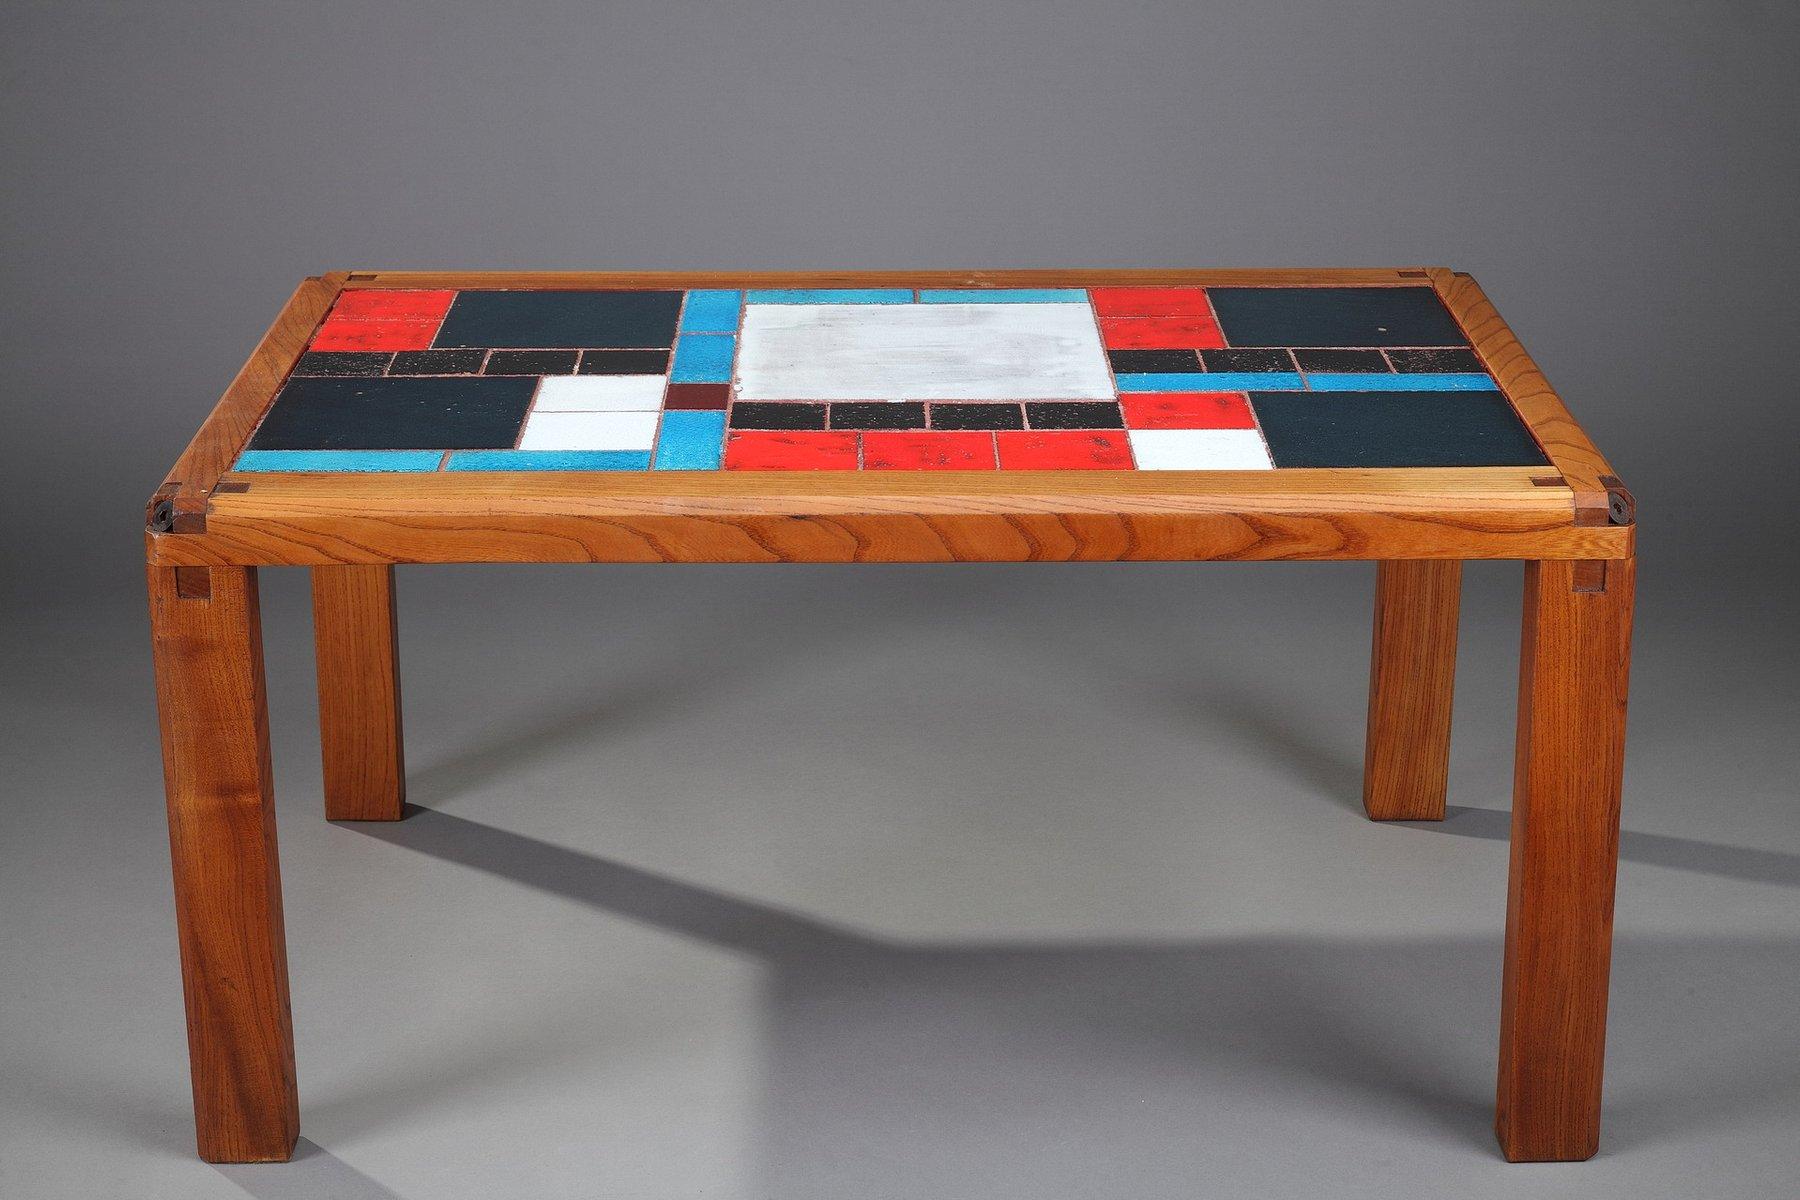 Mid century solid elm ceramic tiles coffee table by pierre chapo ceramic tiles coffee table by pierre chapo 17 398200 price per piece dailygadgetfo Gallery